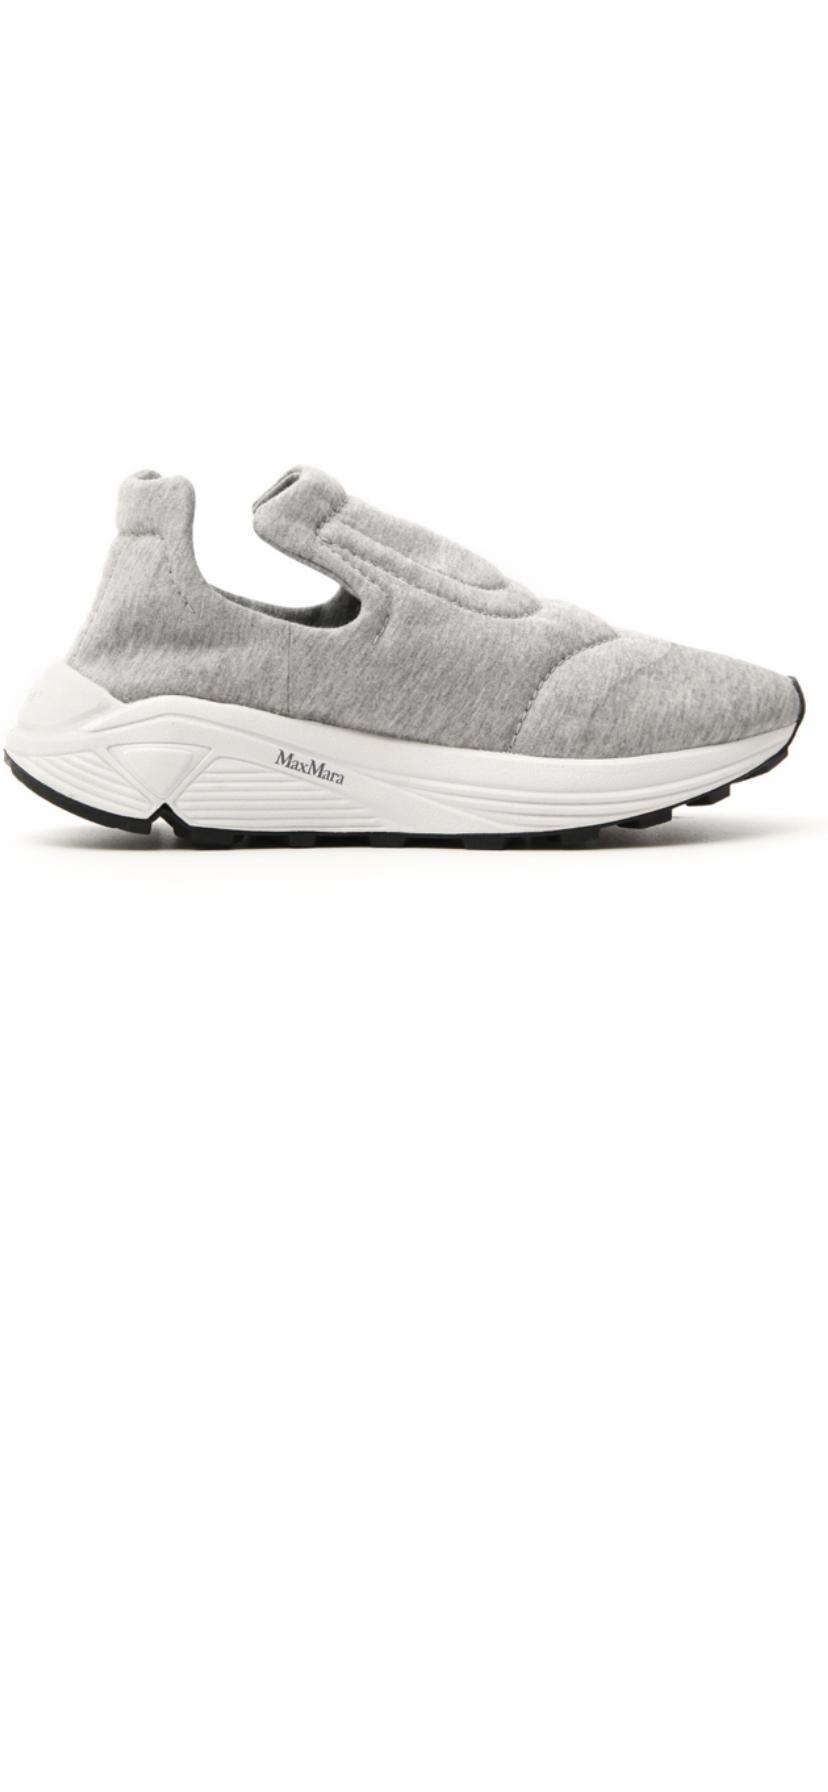 Кроссовки Max Mara, 36 размер